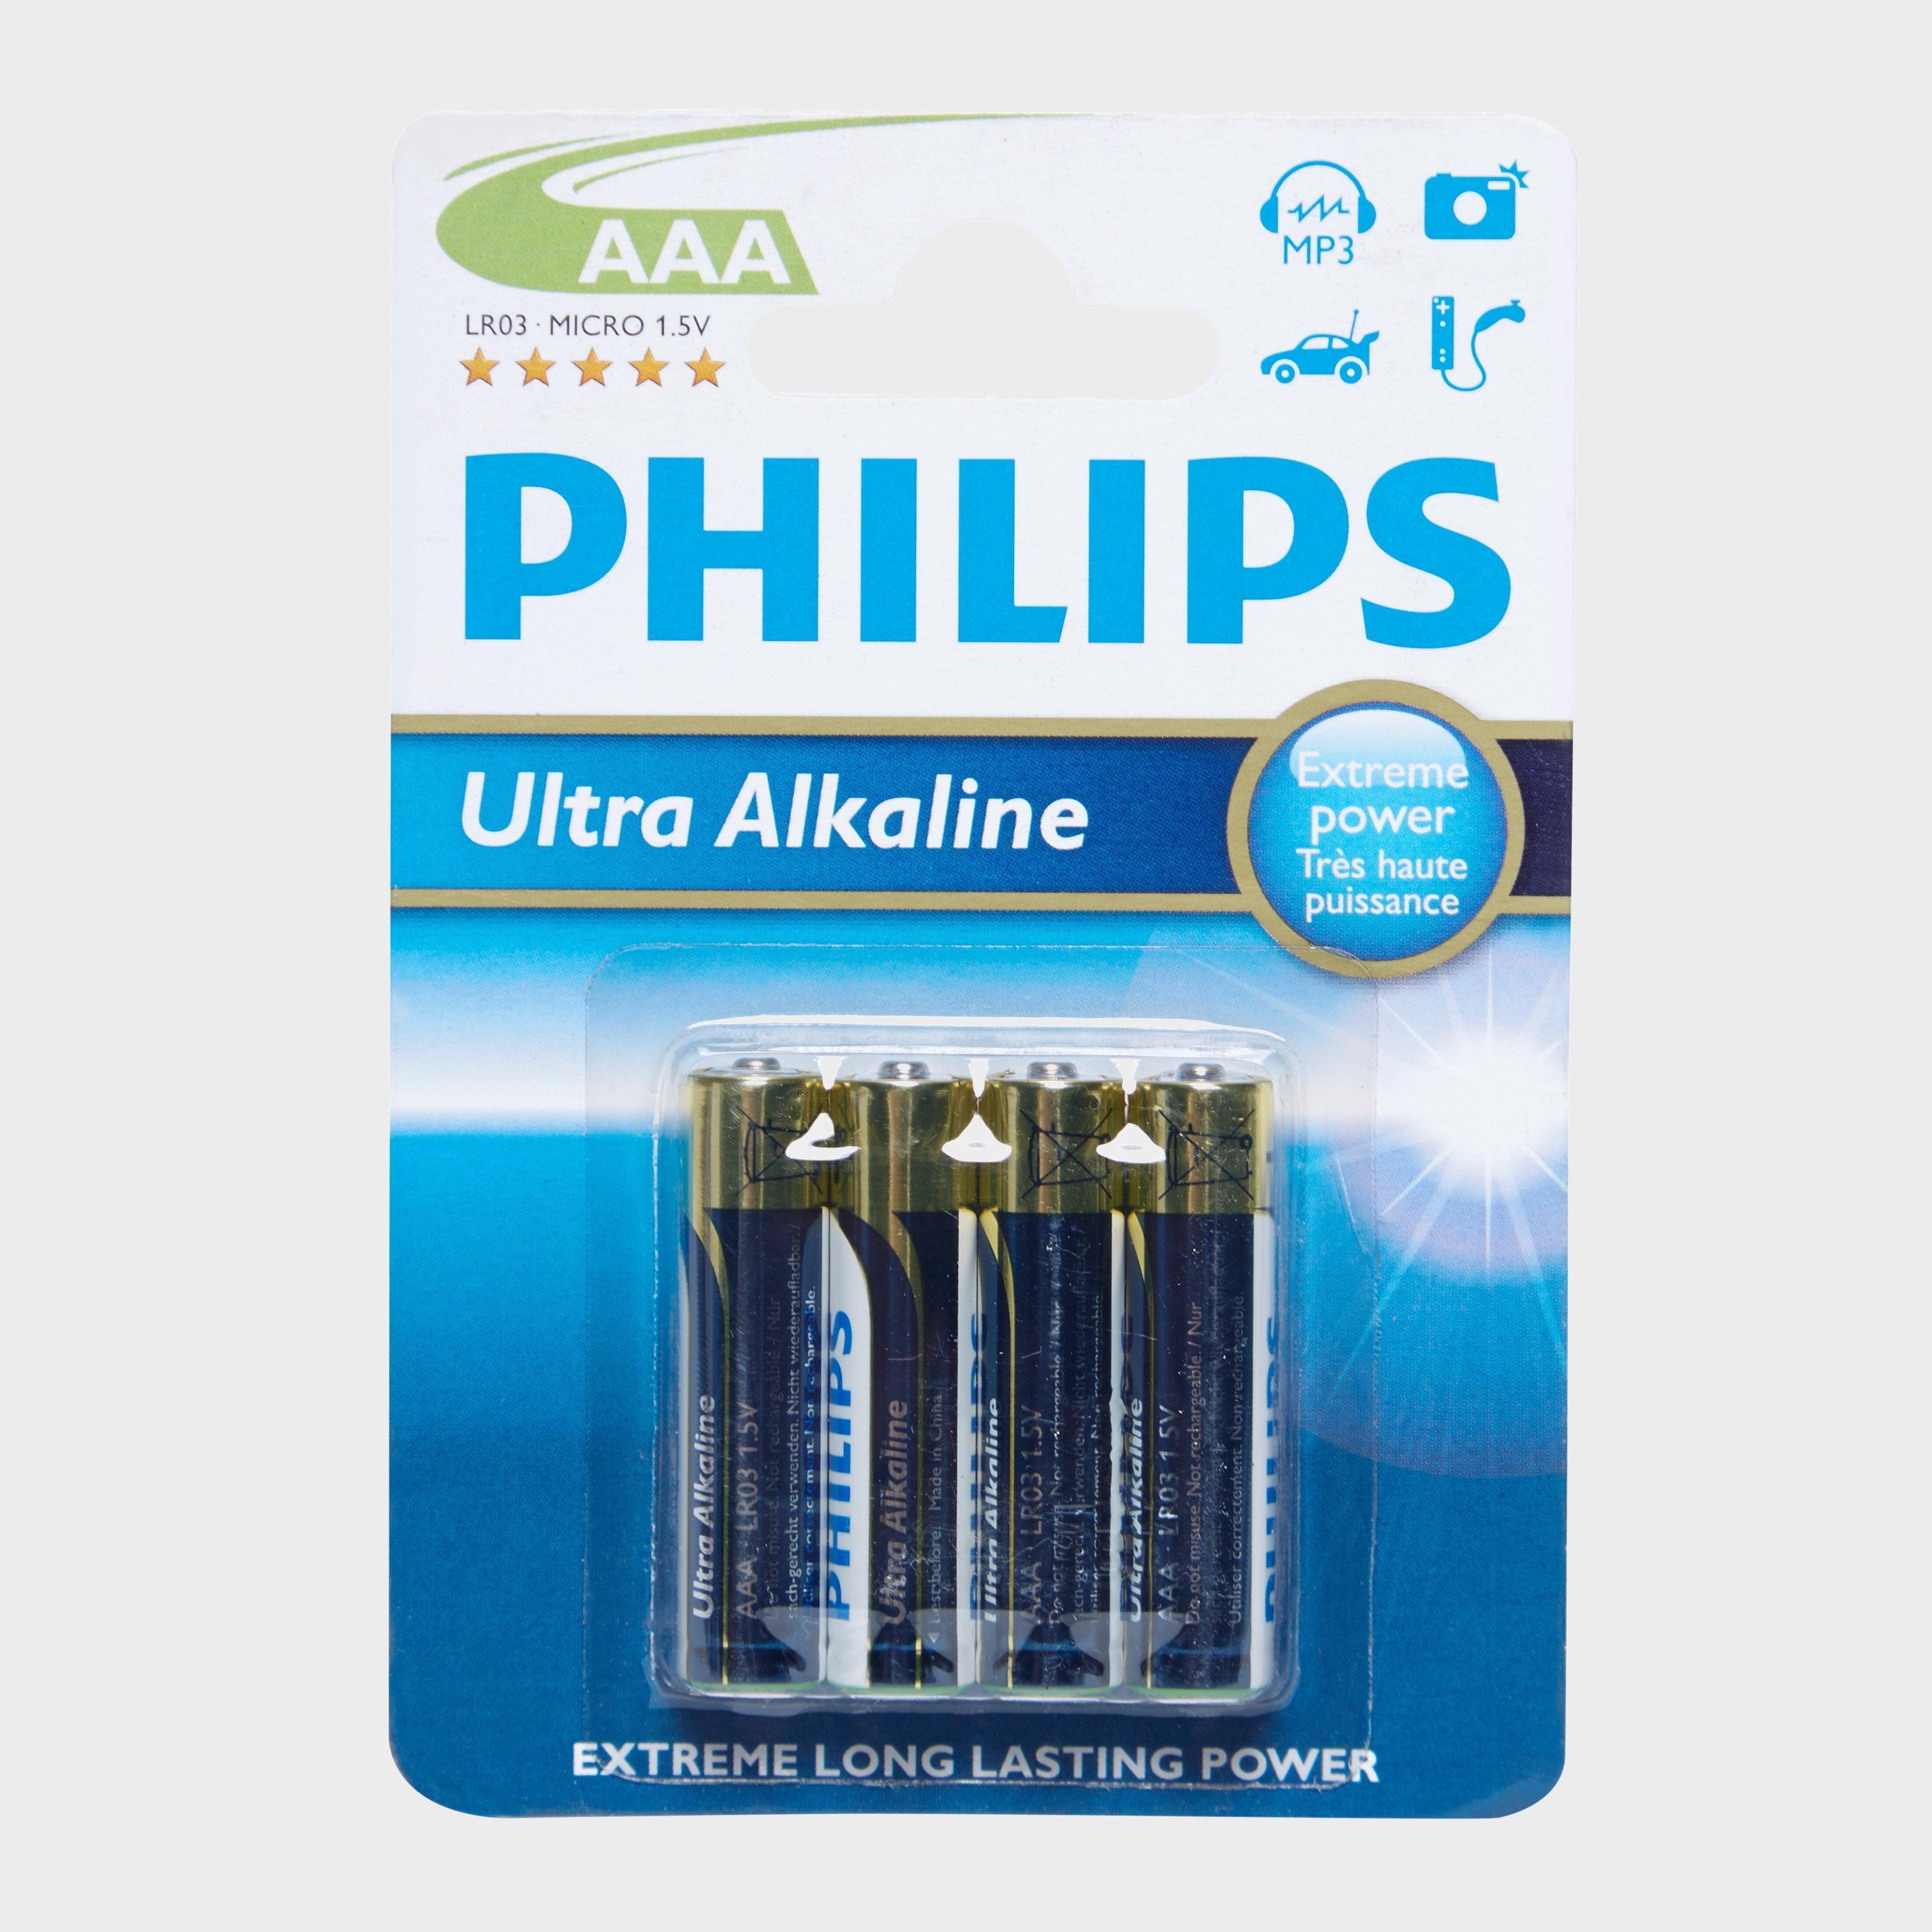 Phillips Ultra Alkaline AAA LR03 Batteries 4 Pack, Multi